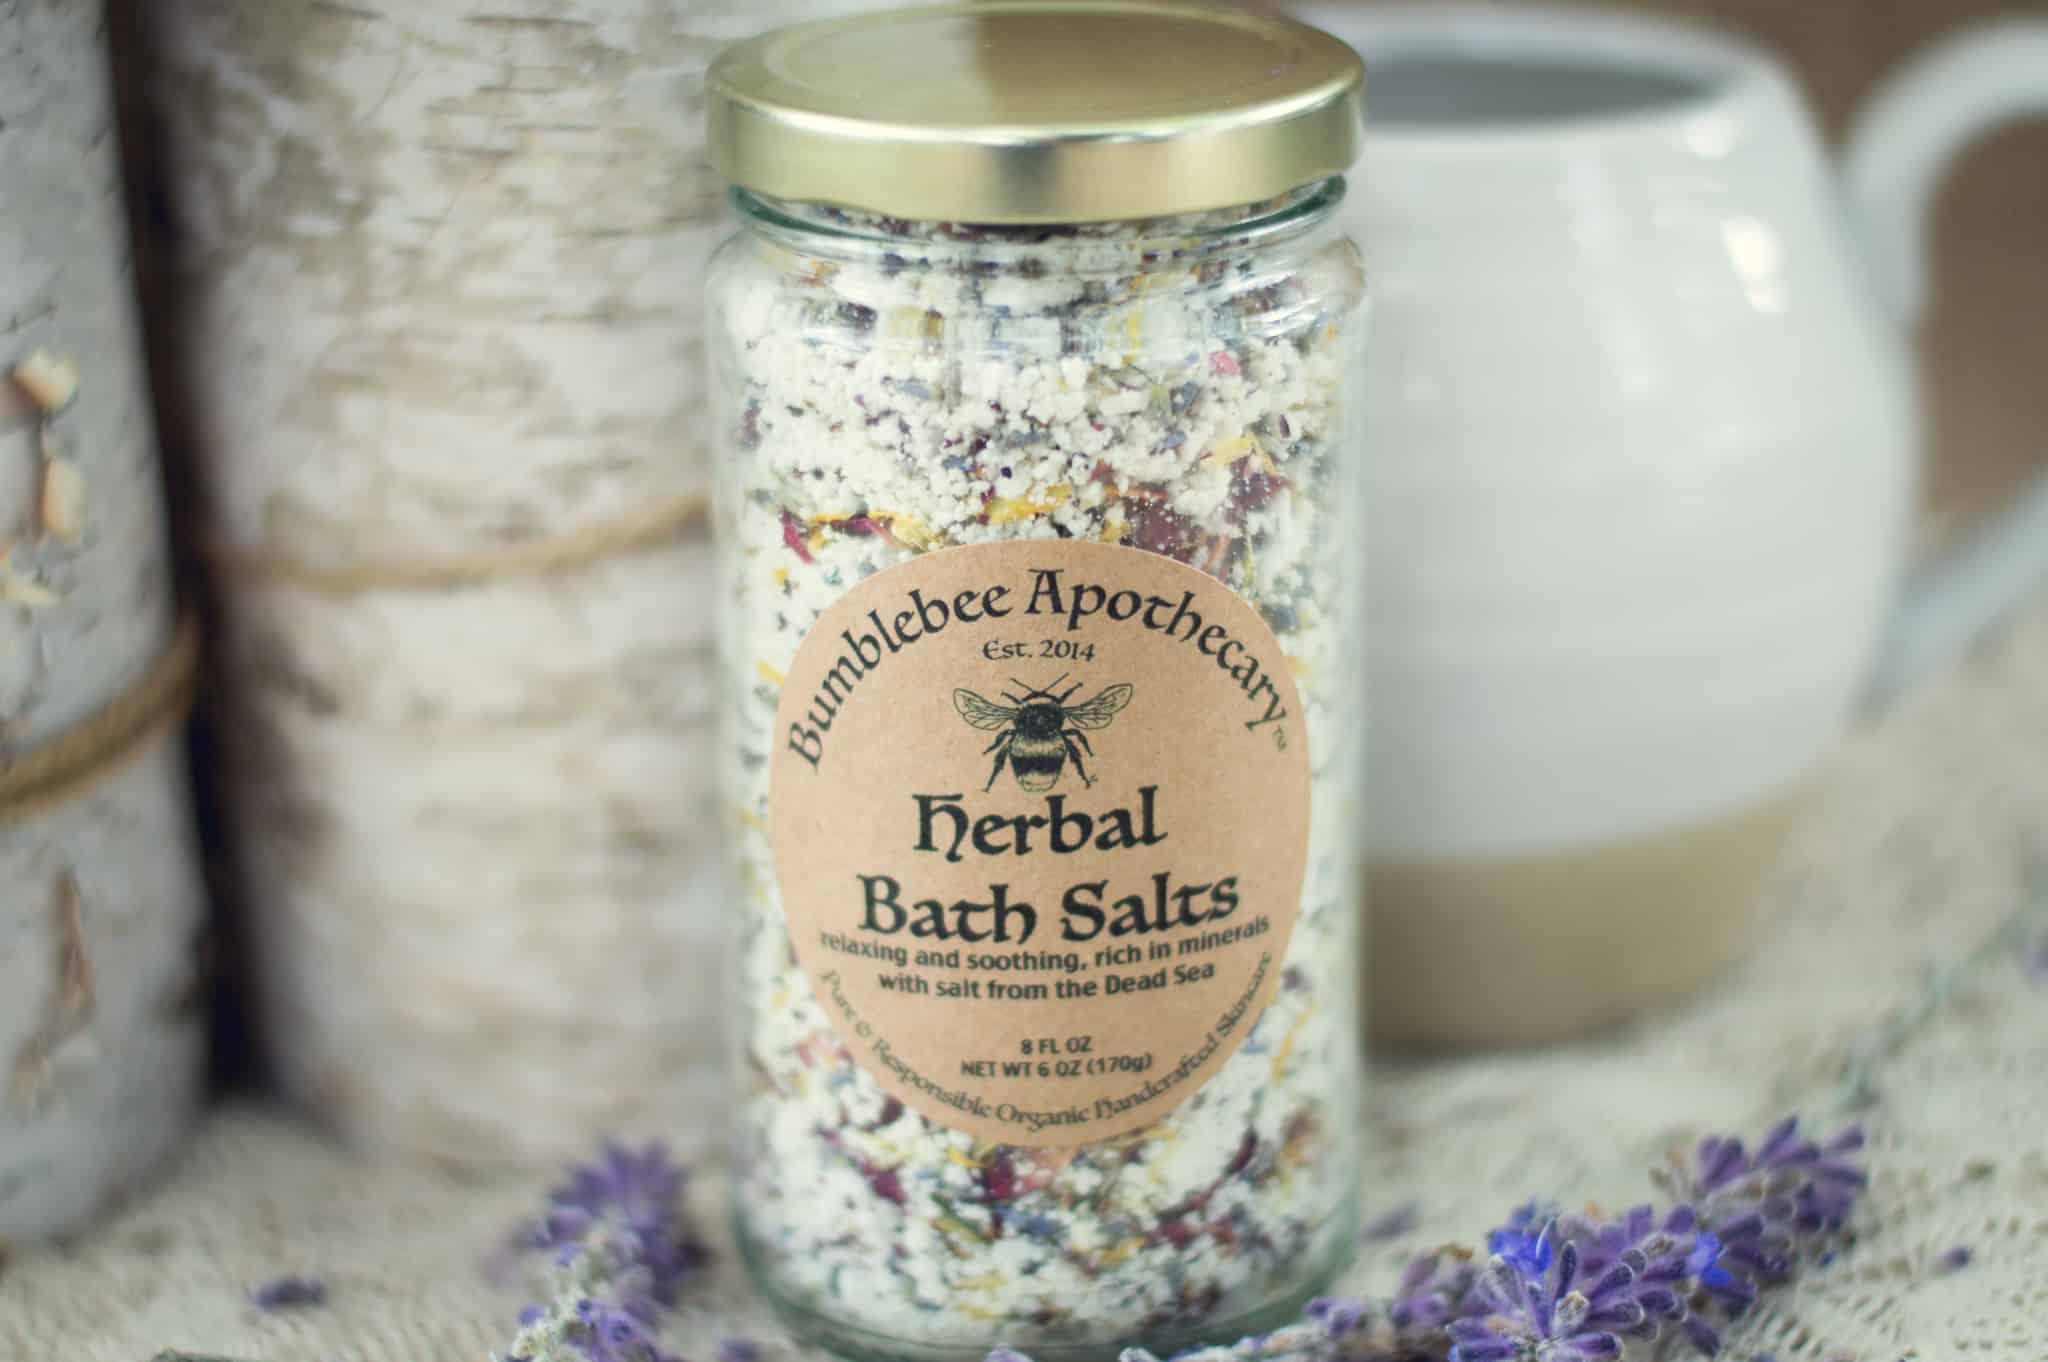 Herbal bath salts recipe Epsom salts